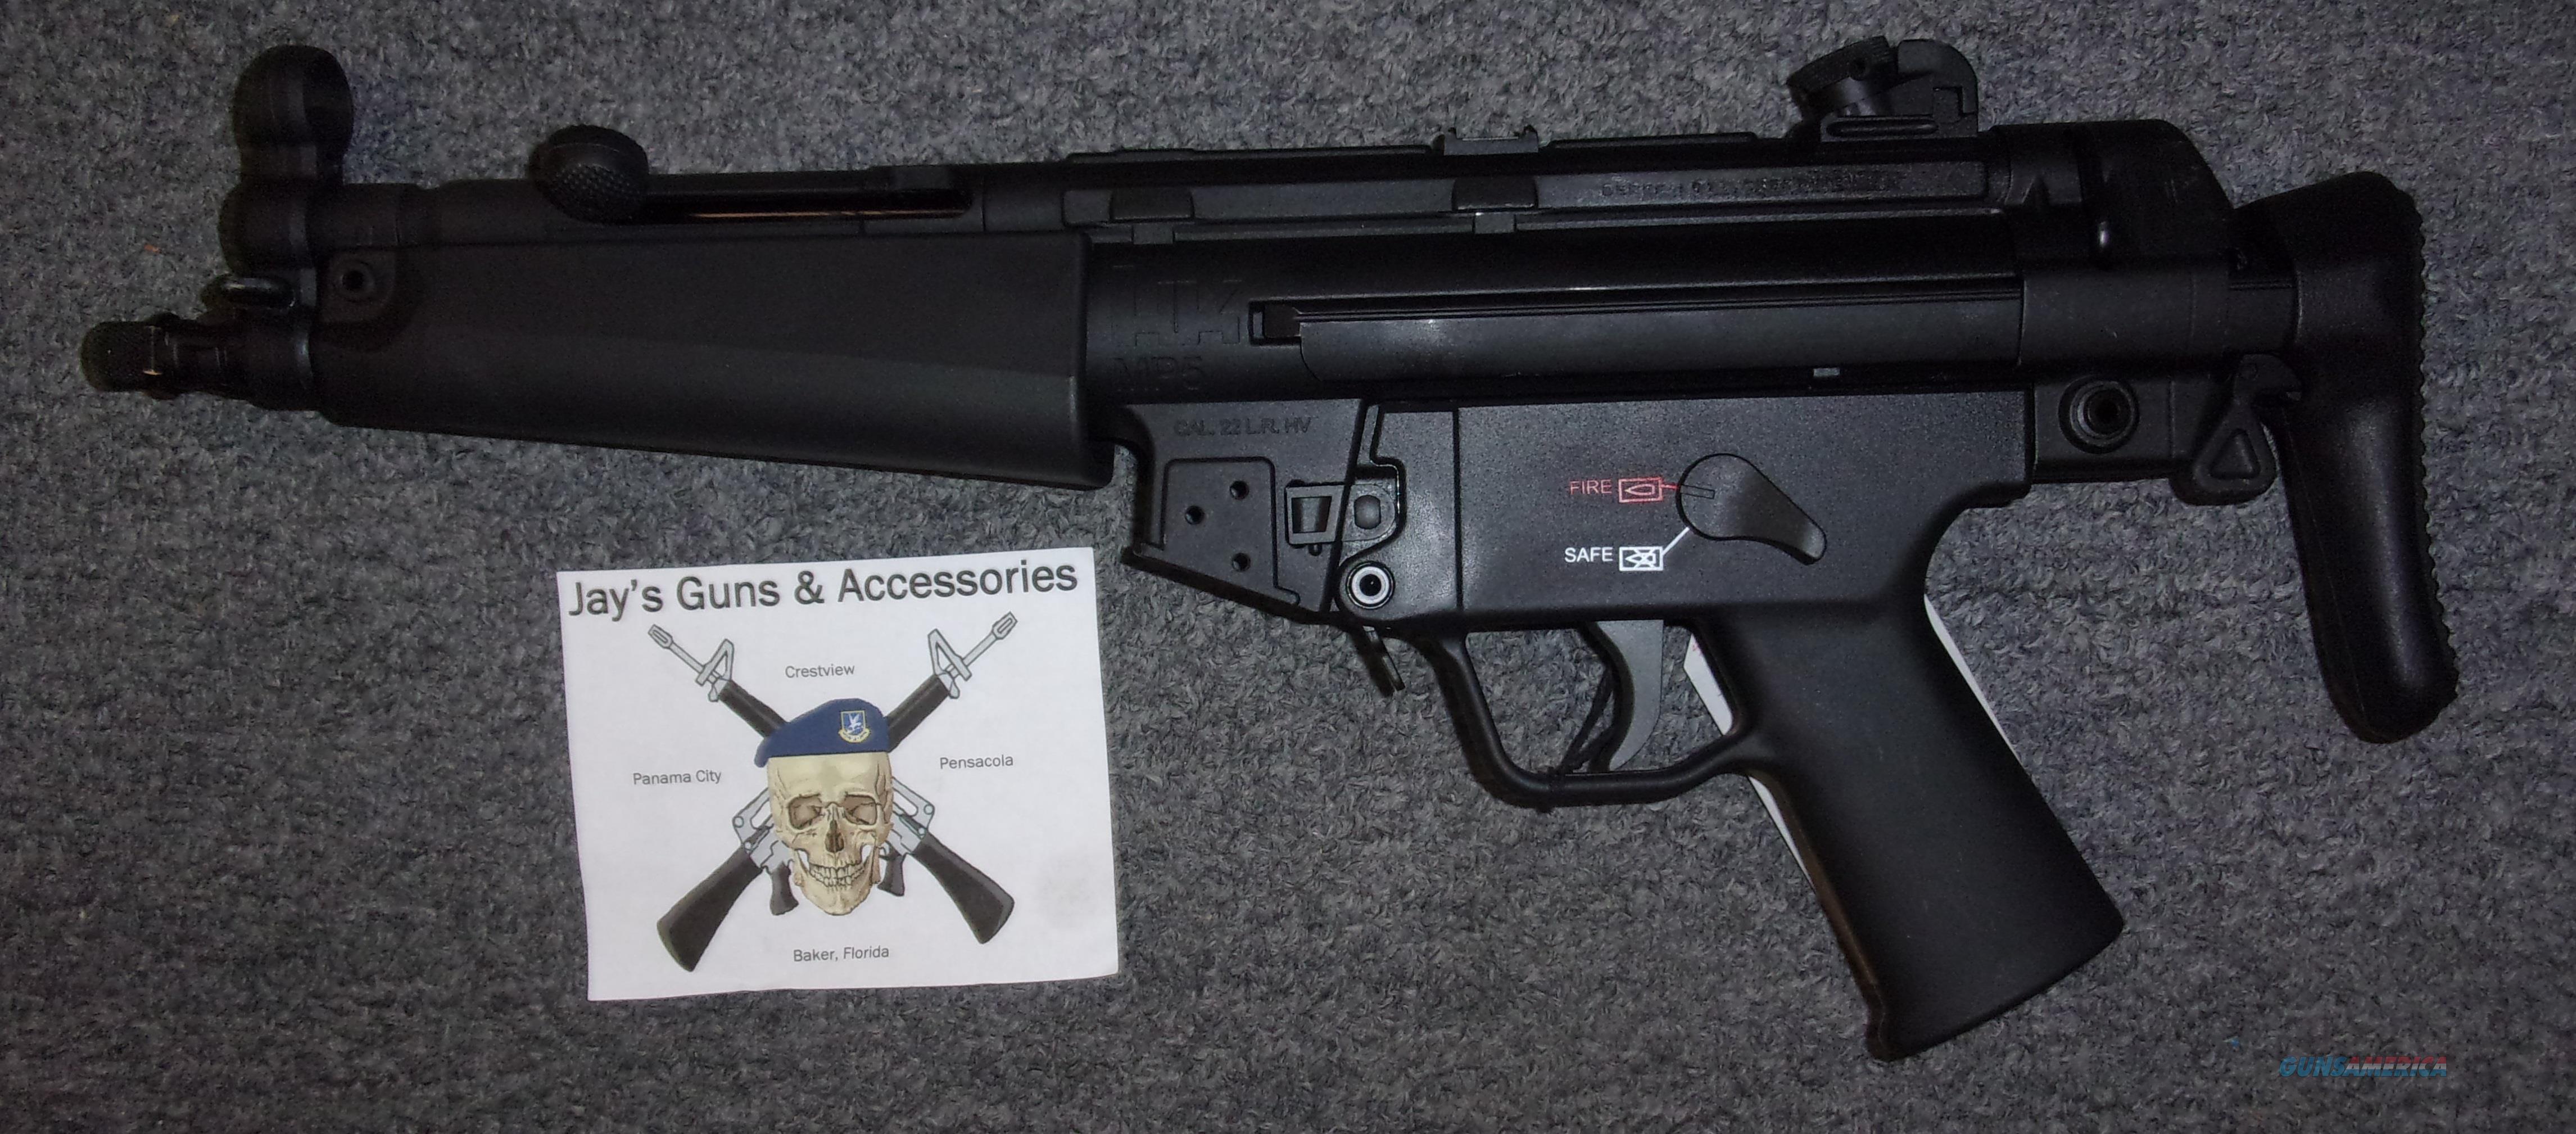 Carl Walther MP5 SBR  Guns > Rifles > Class 3 Rifles > Class 3 Subguns